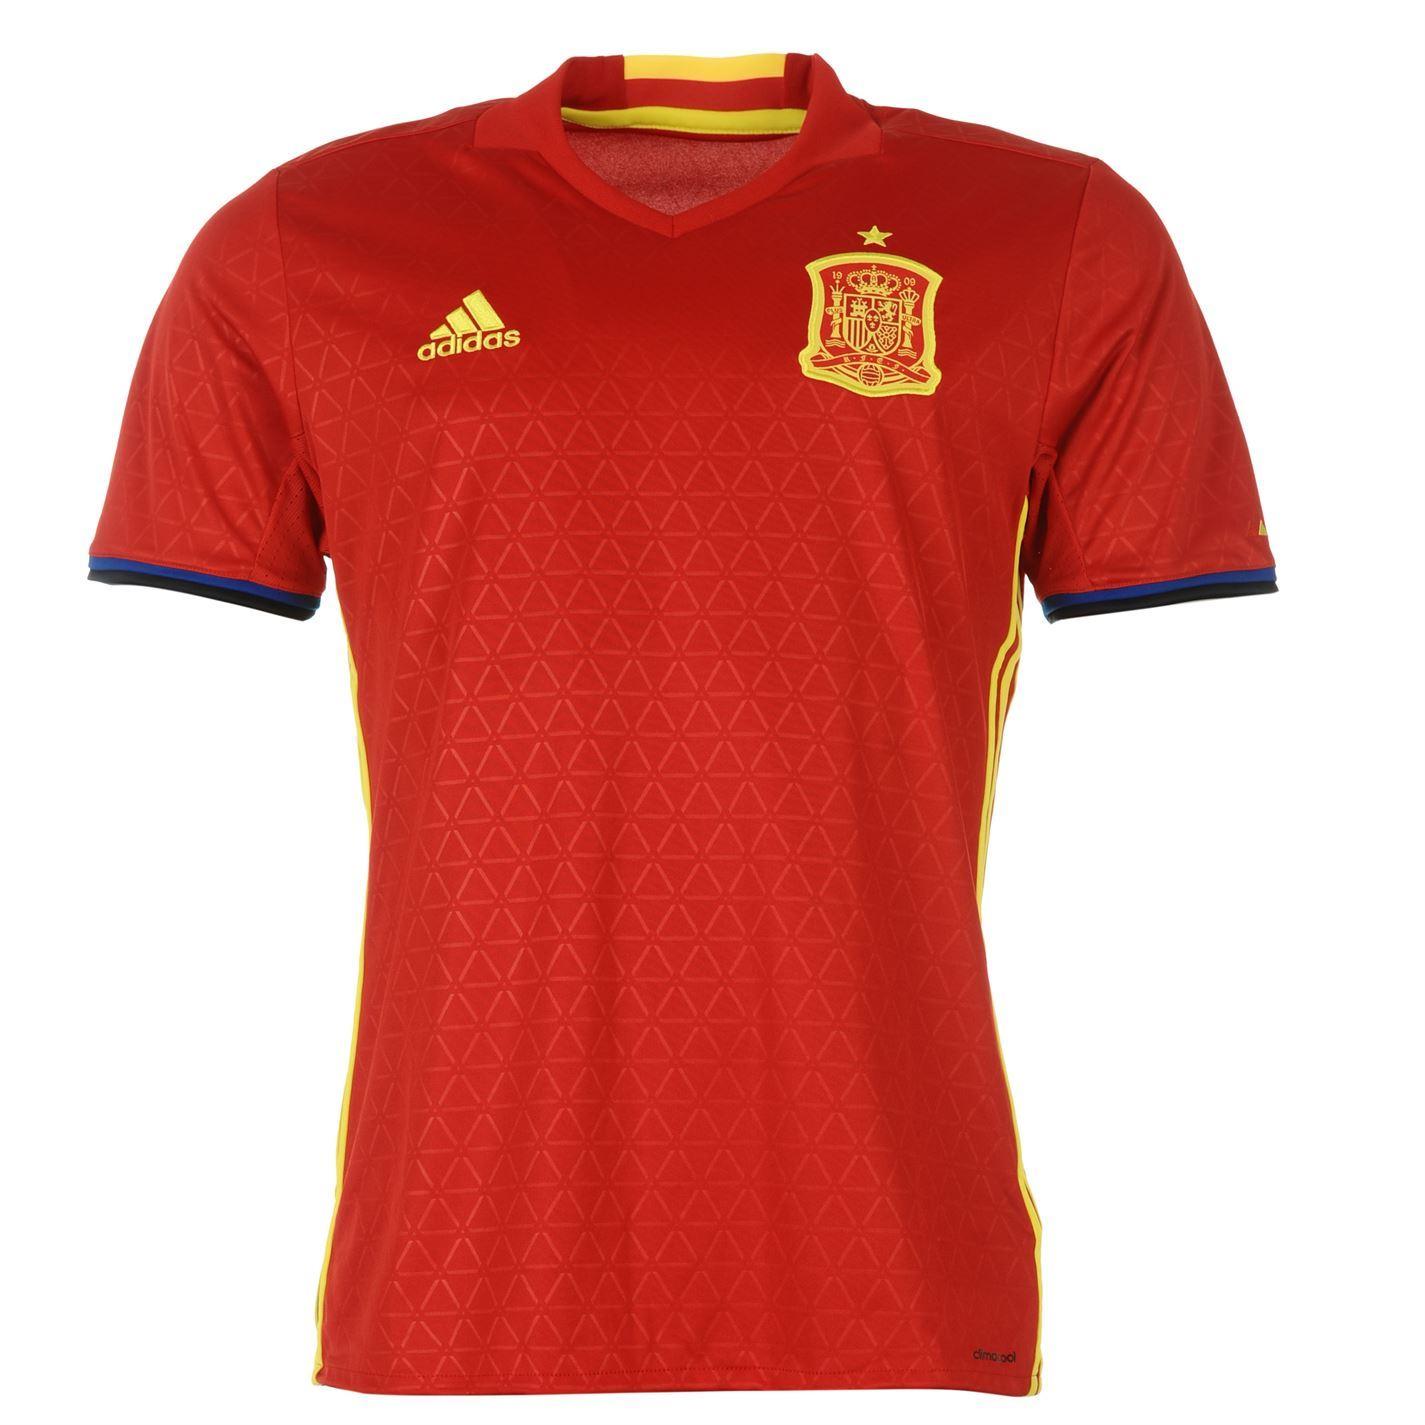 f140133943b95 ... Adidas España Home Jersey 2016 hombres rojo amarillo fútbol fútbol  camiseta Top ...